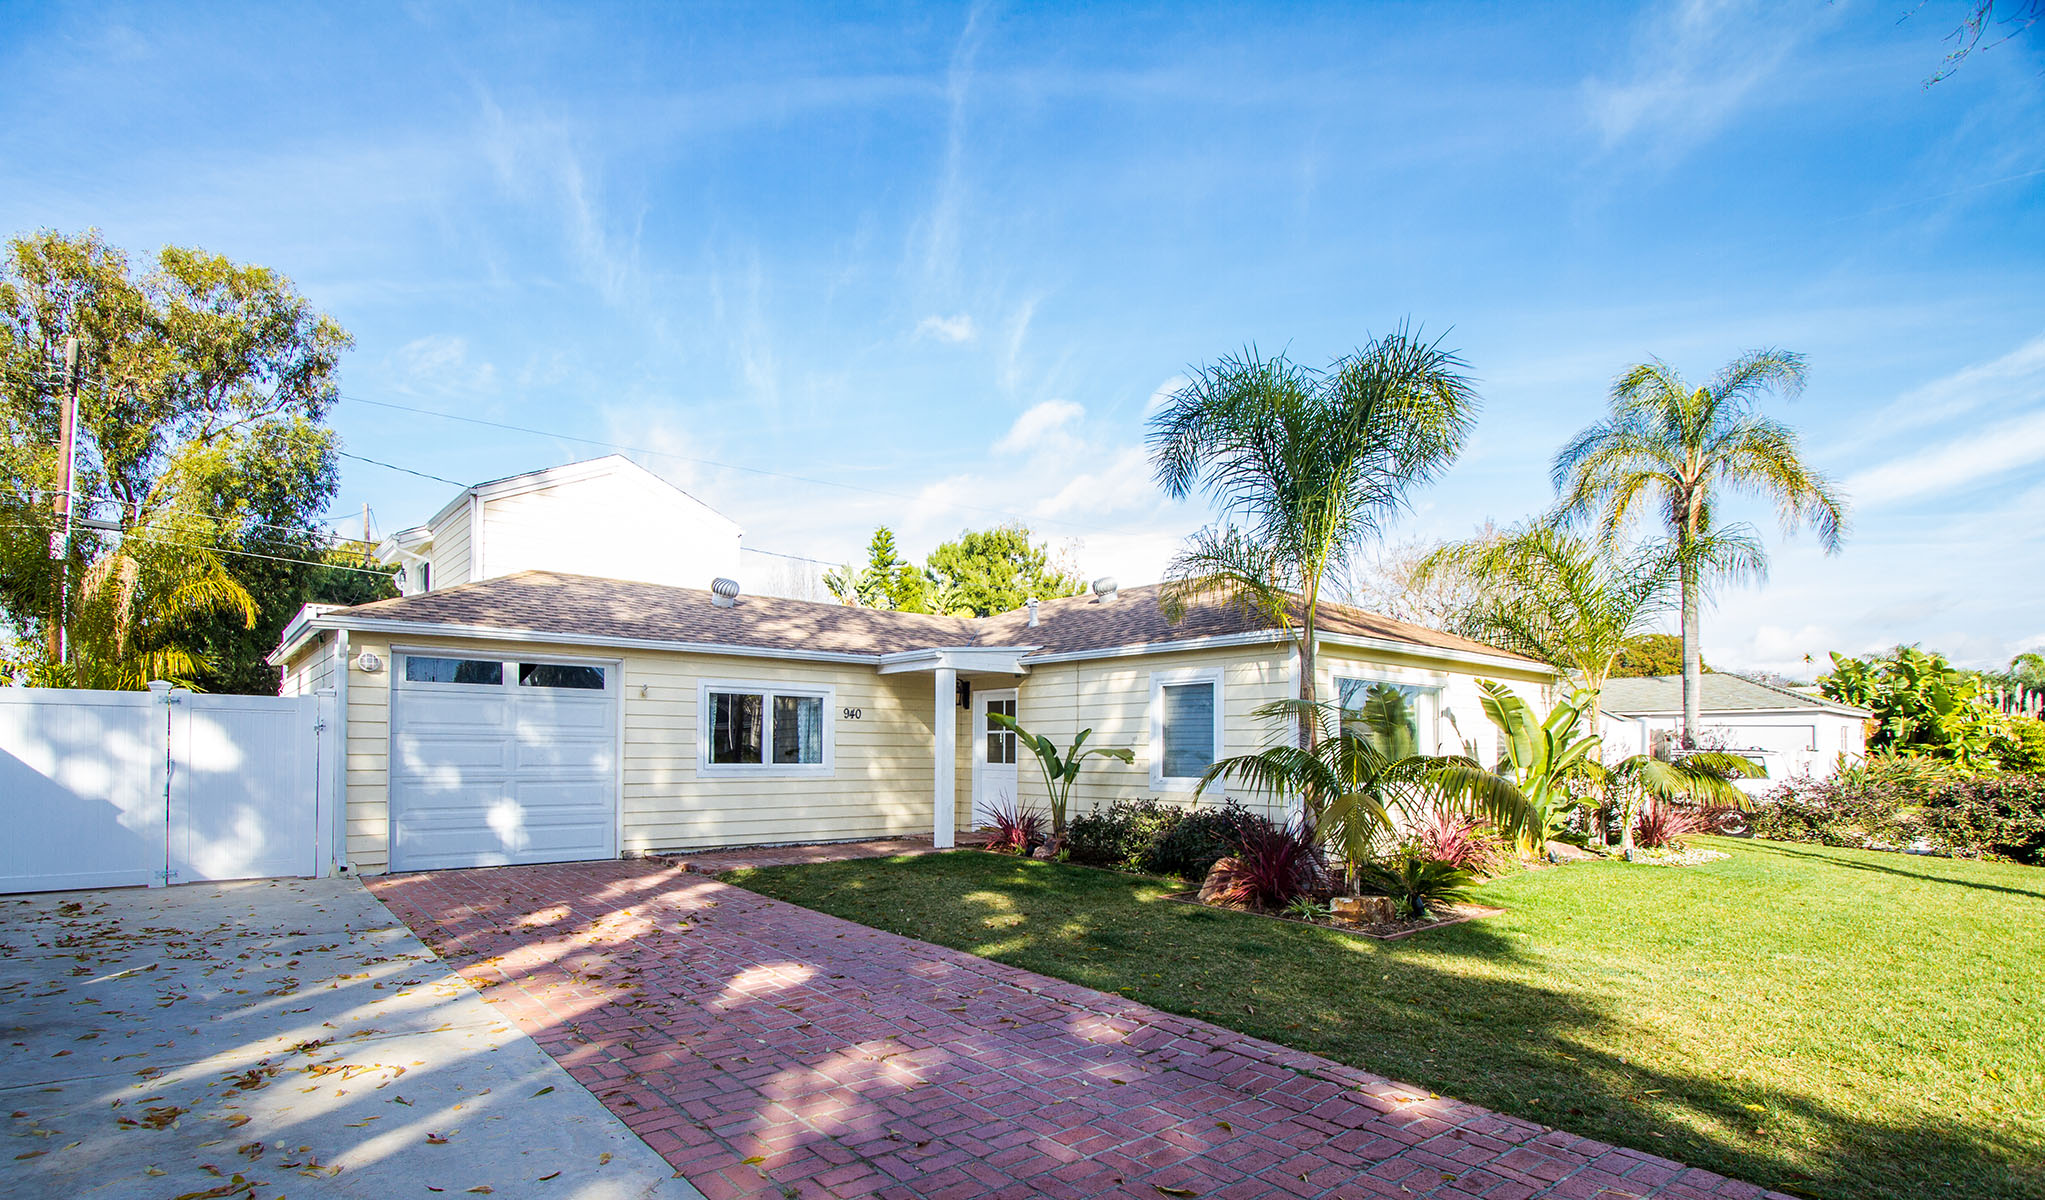 Single Family Home for Sale at 940 Dogwood Street Costa Mesa, California, 92627 United States